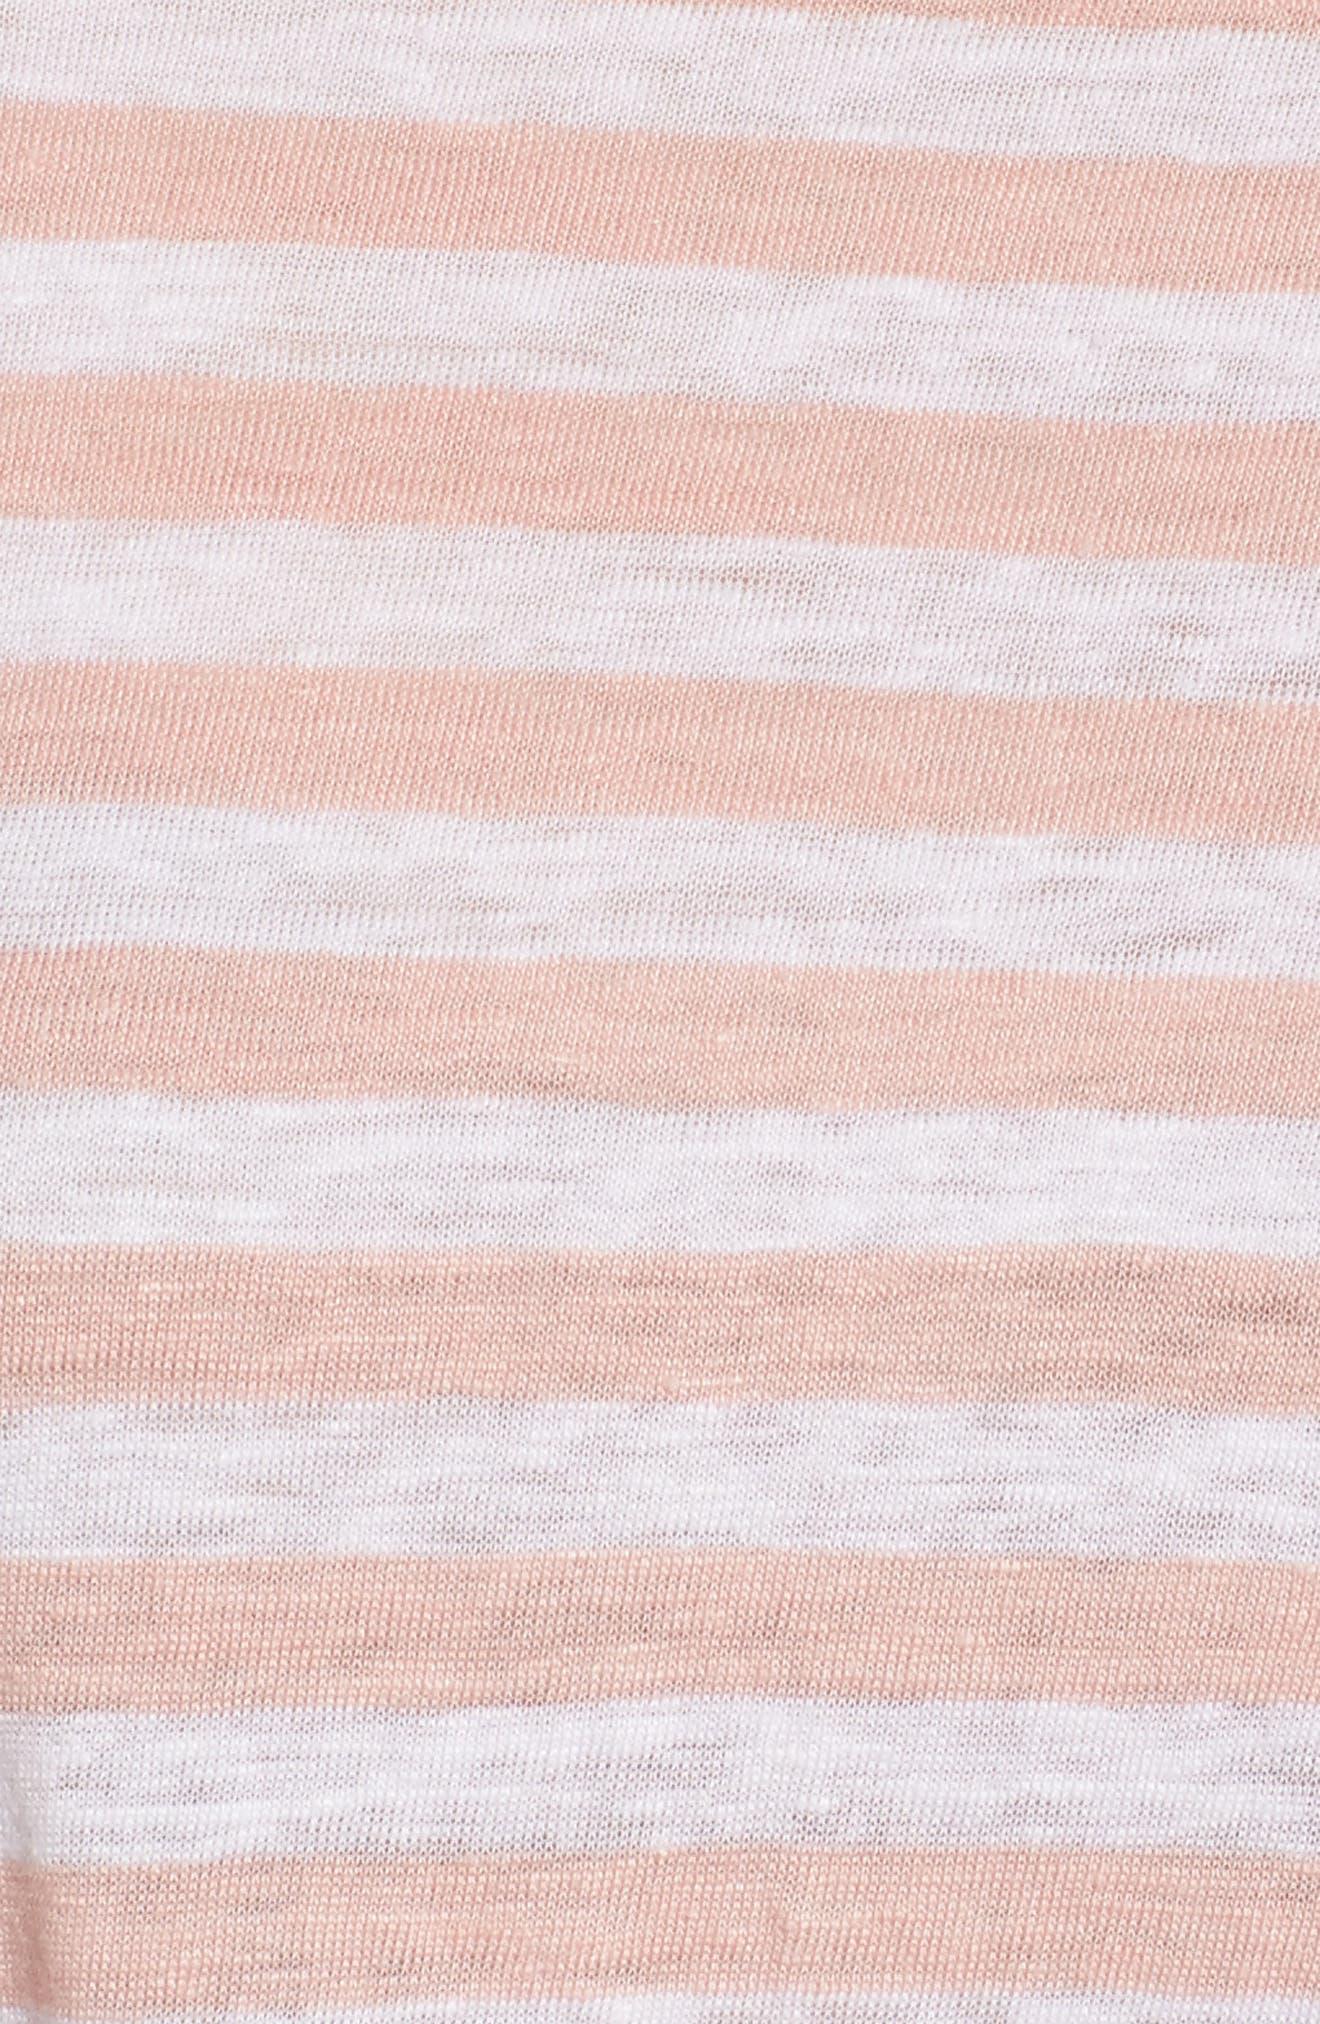 Billie Stripe Pocket Tee,                             Alternate thumbnail 5, color,                             BLUSH TRICOLOR